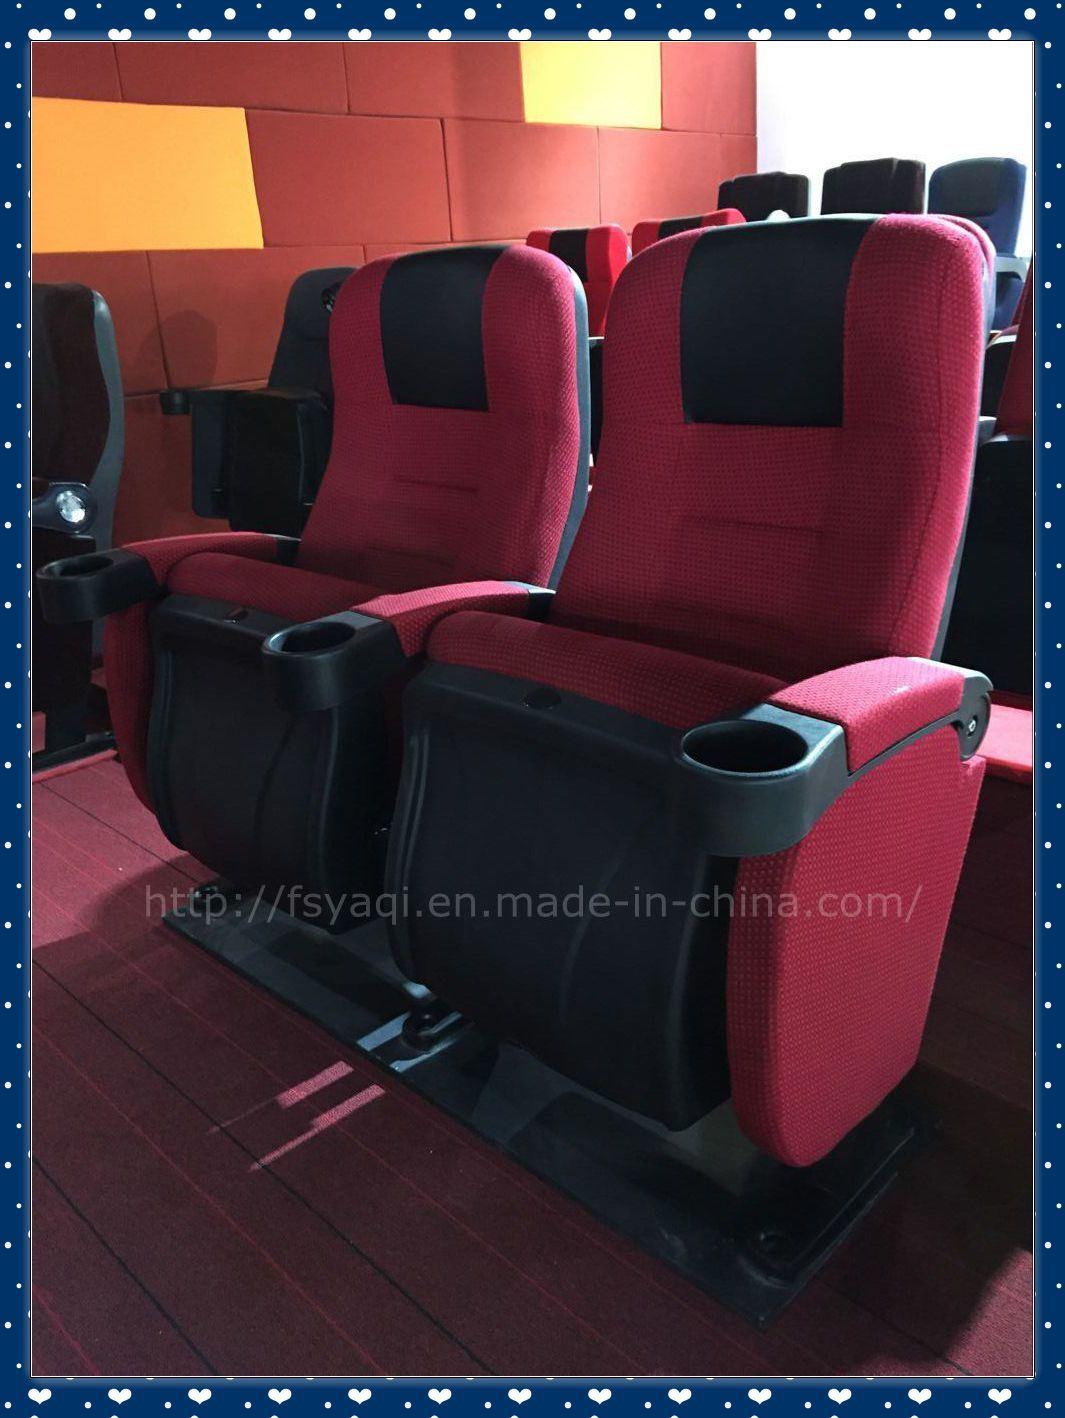 New Design Auditorium Theater Seating PP Cinema Chair (YA-016)